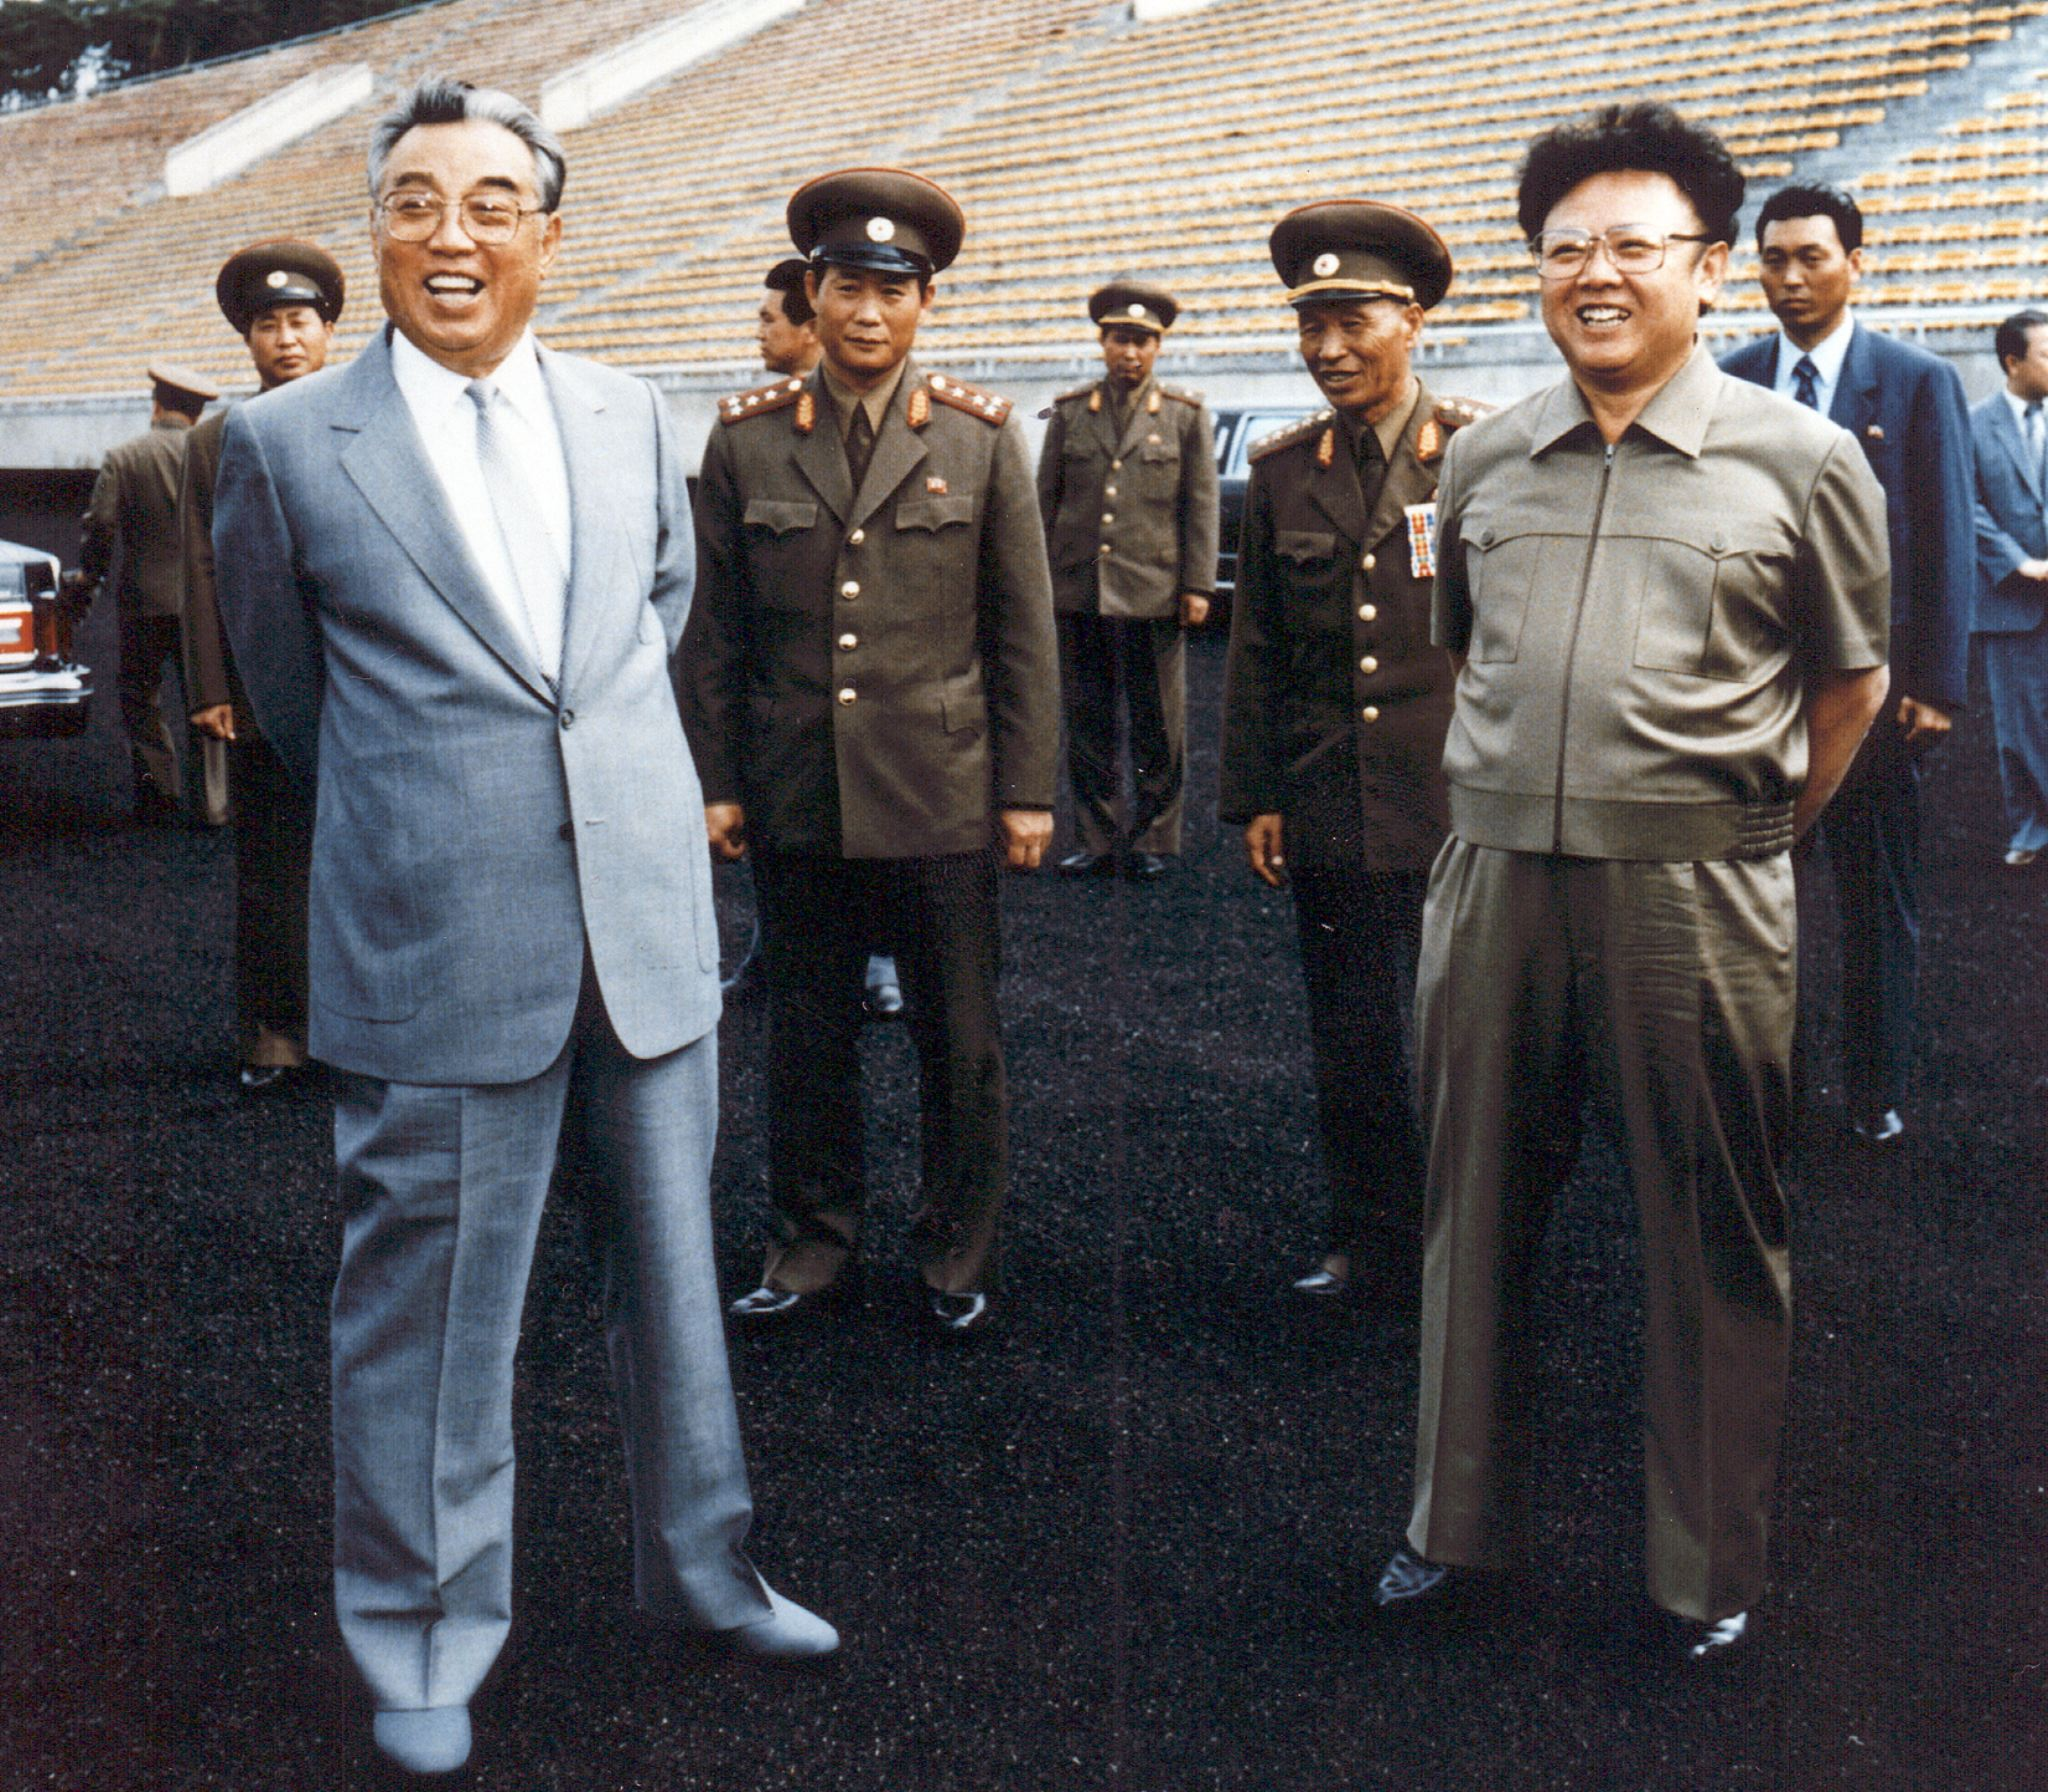 File photo taken in 1992 shows North Korean leader